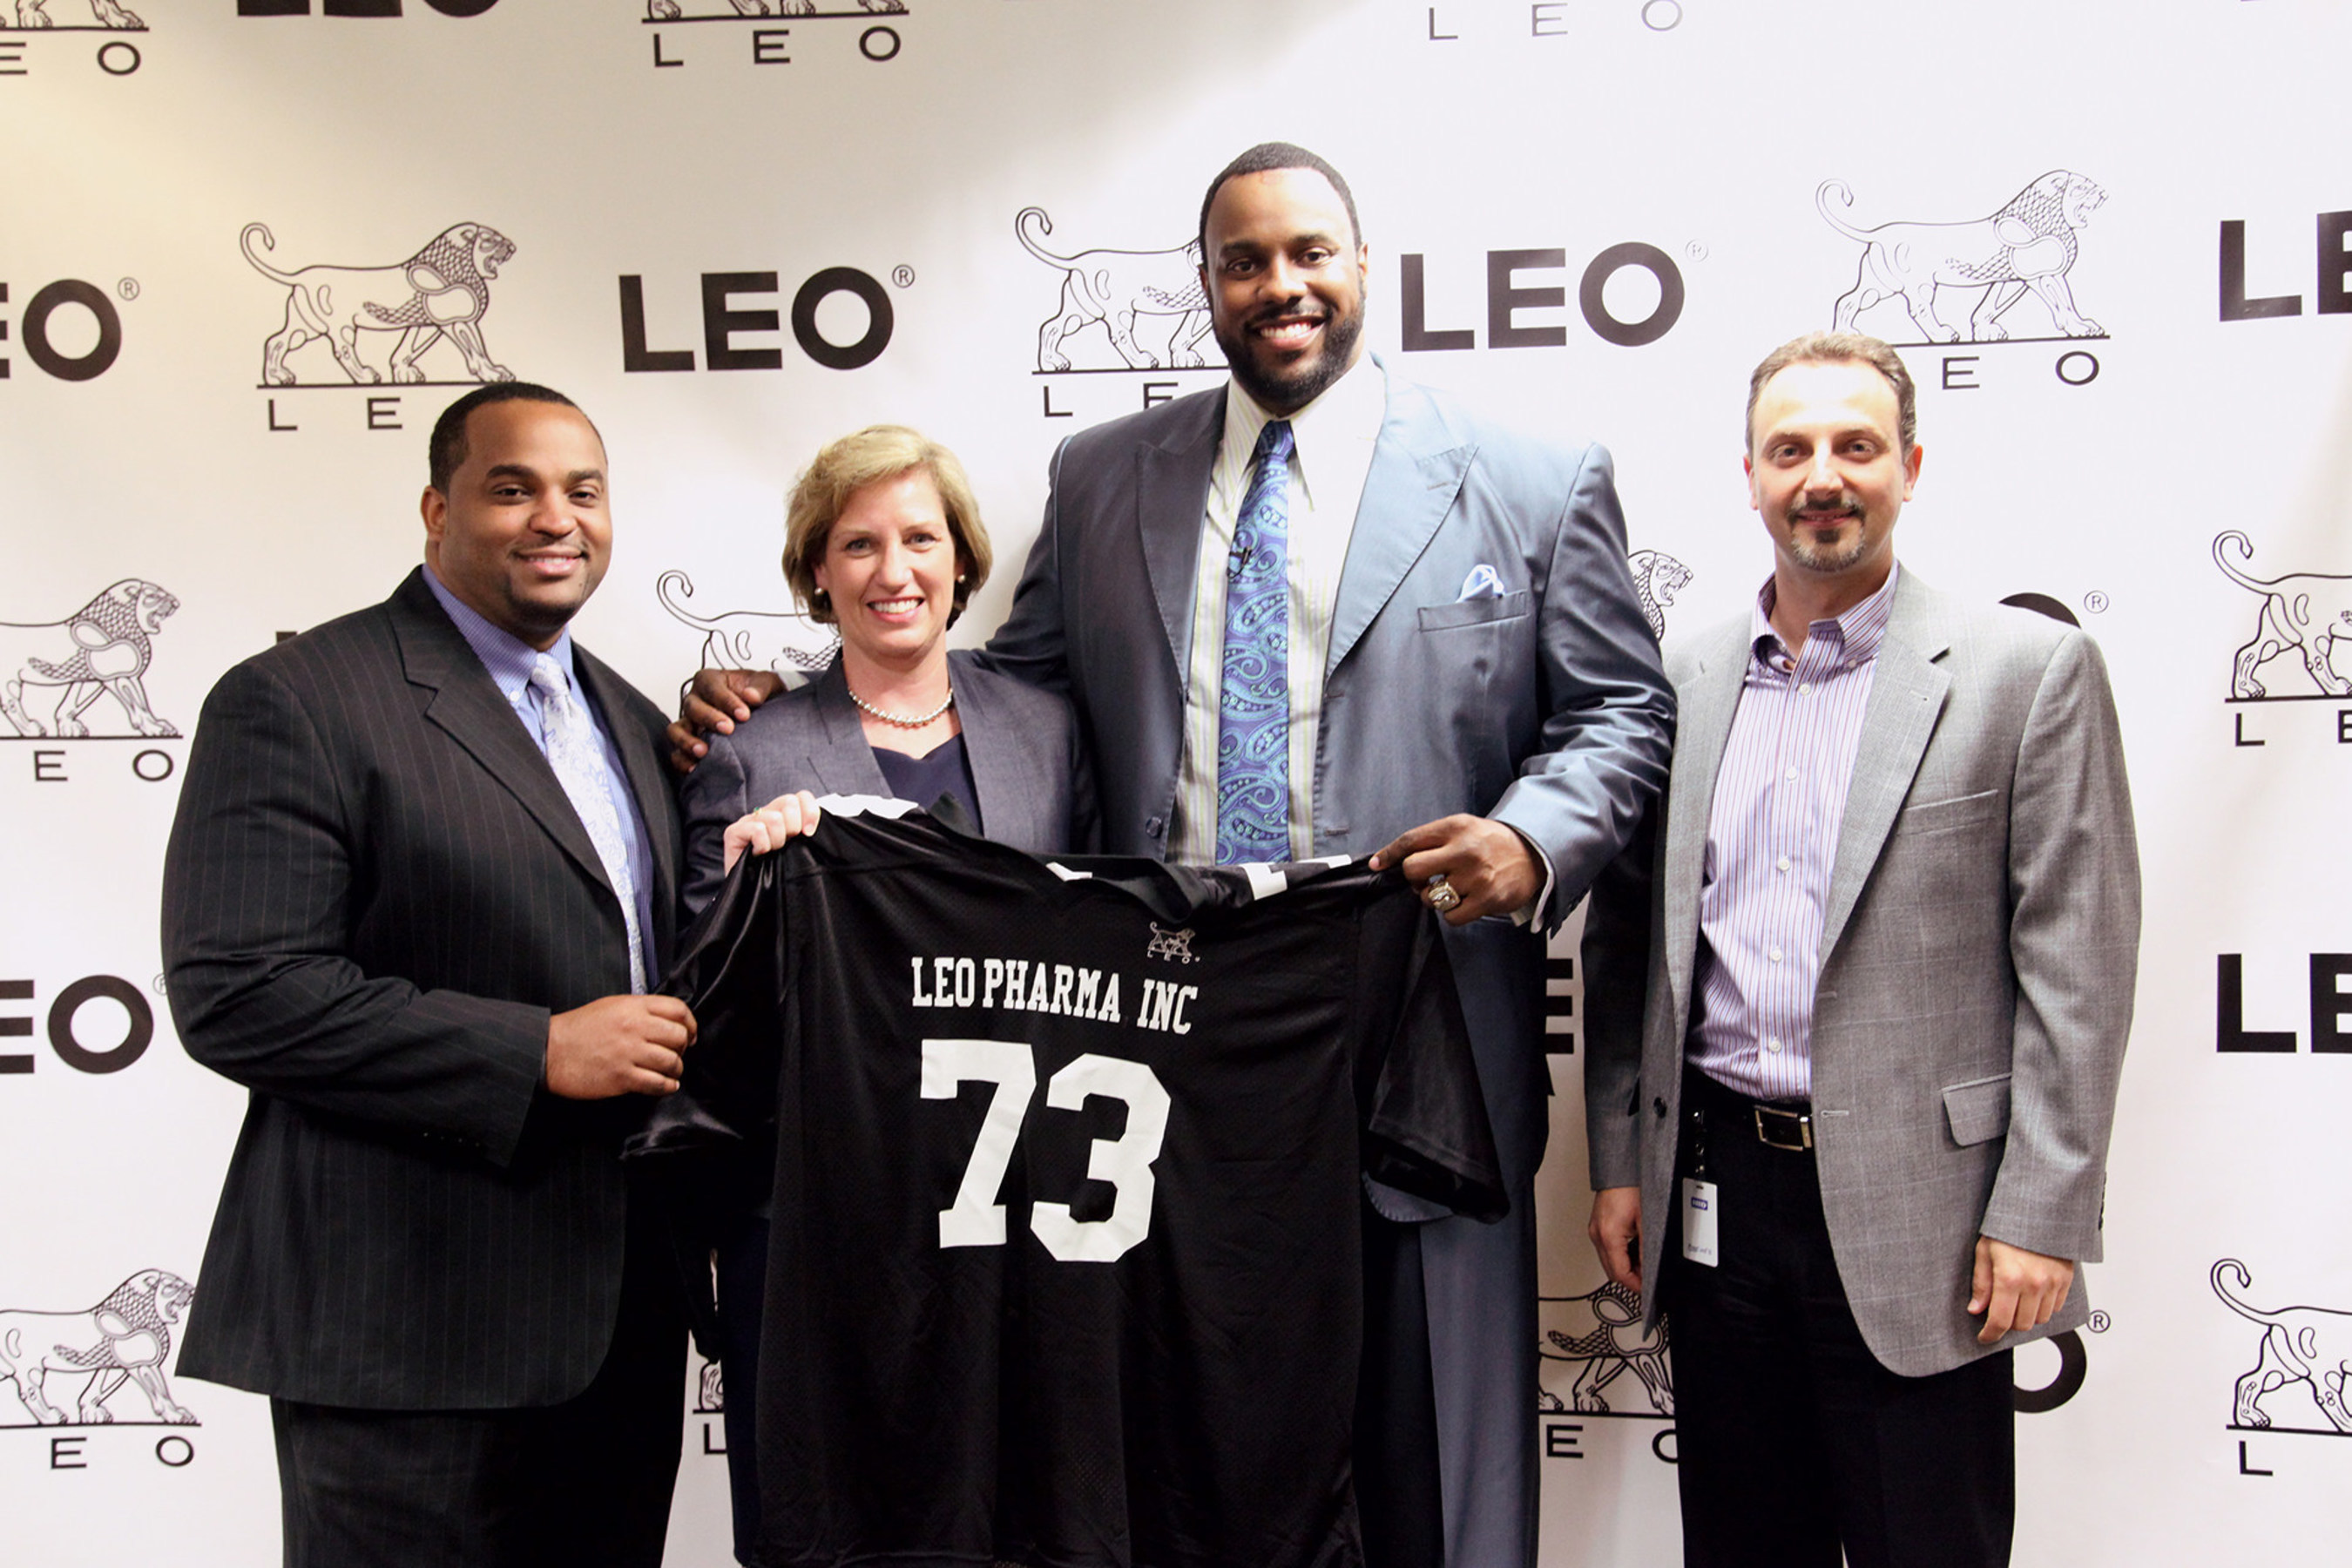 LEO Pharma Inc. and Professional Football Player Jonathan Scott Partner To Increase Psoriasis